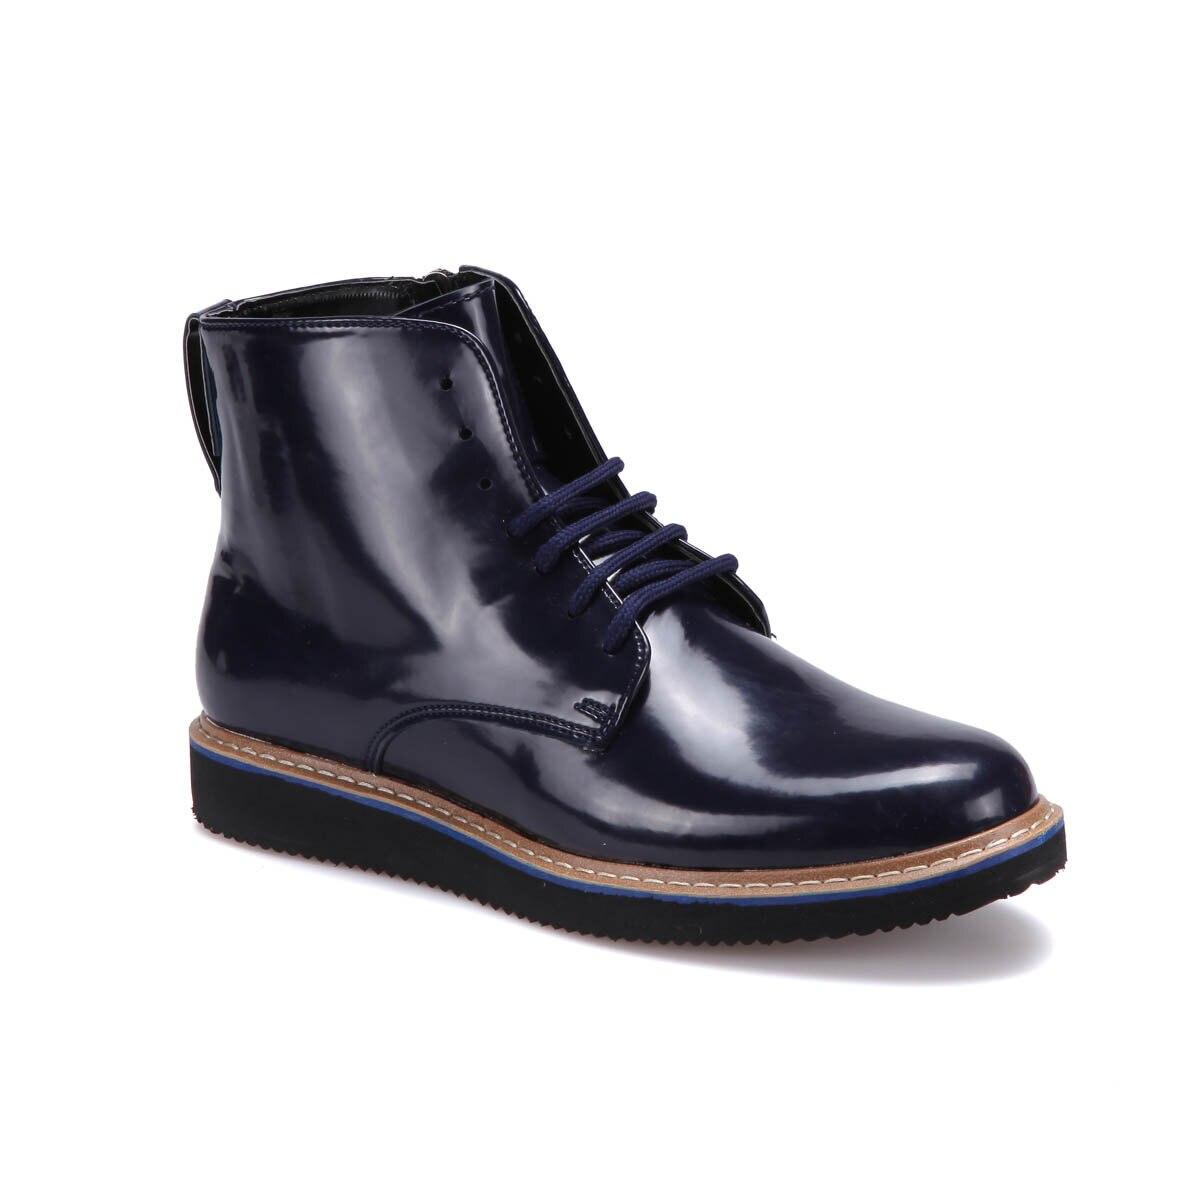 FLO 5815 M 6686 Navy Blue Men 'S Boots JJ-Stiller